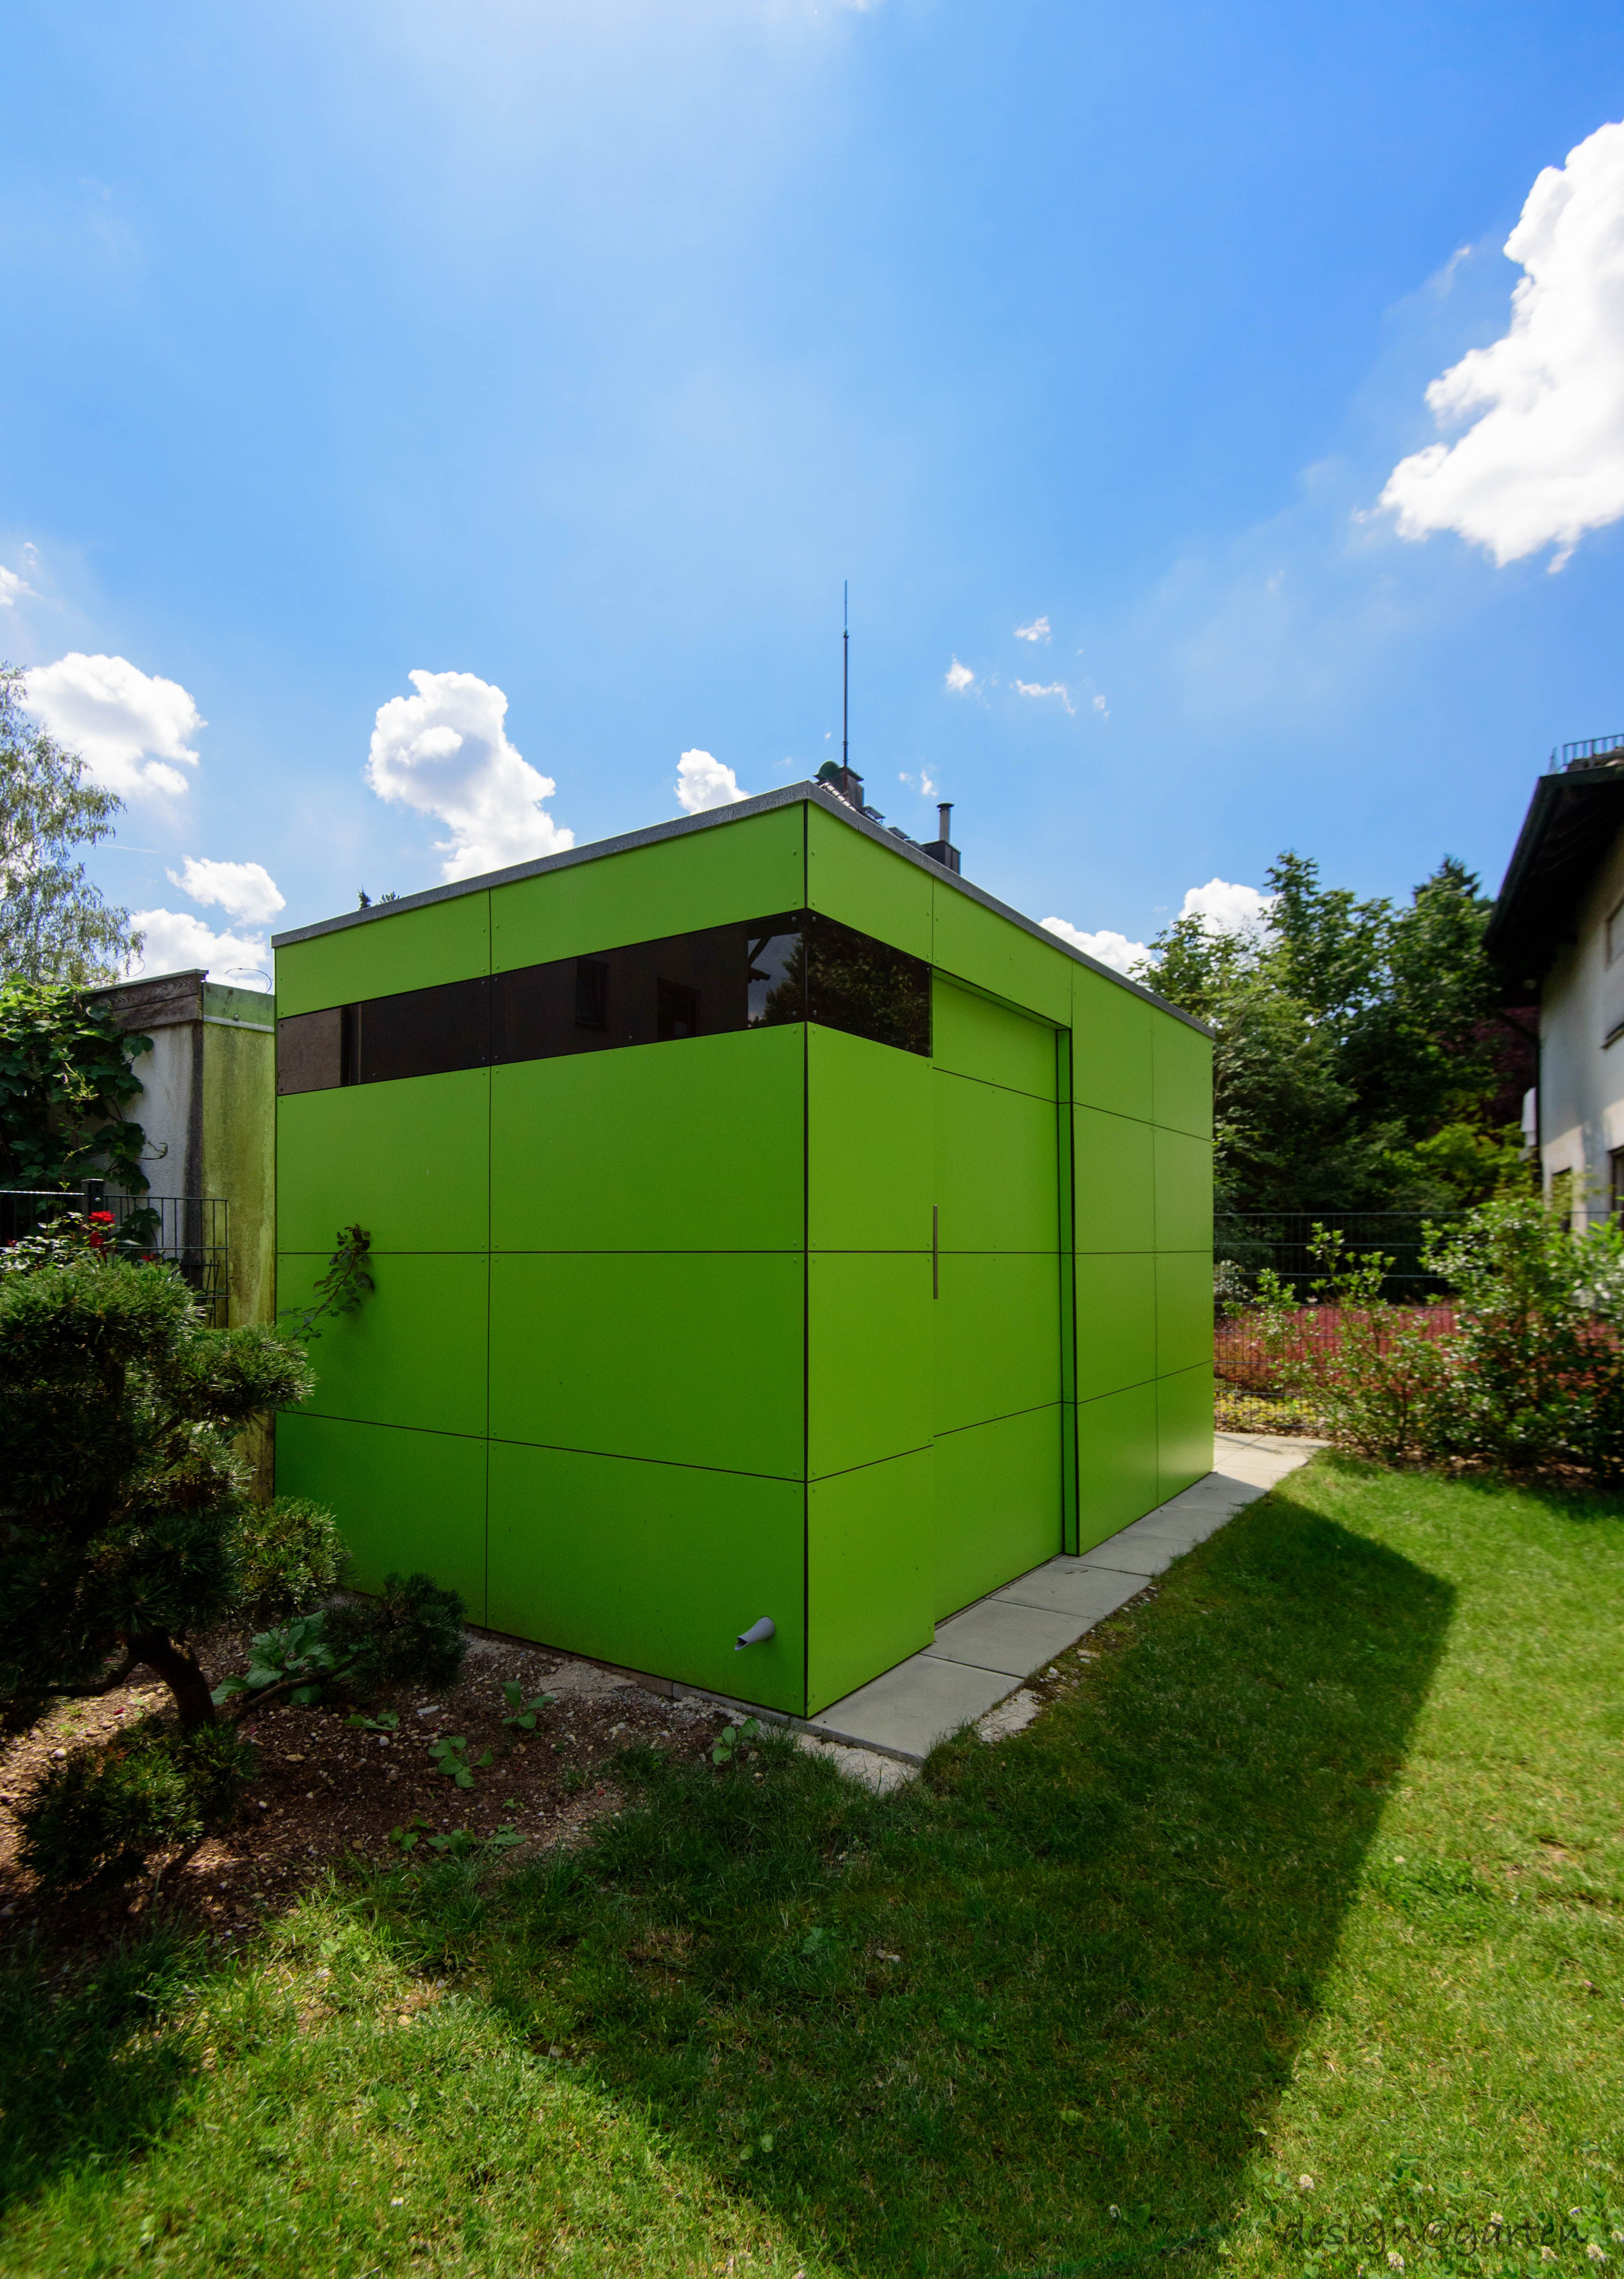 design gartenhaus / Fahrradhaus @_gart drei | lime green | niemals